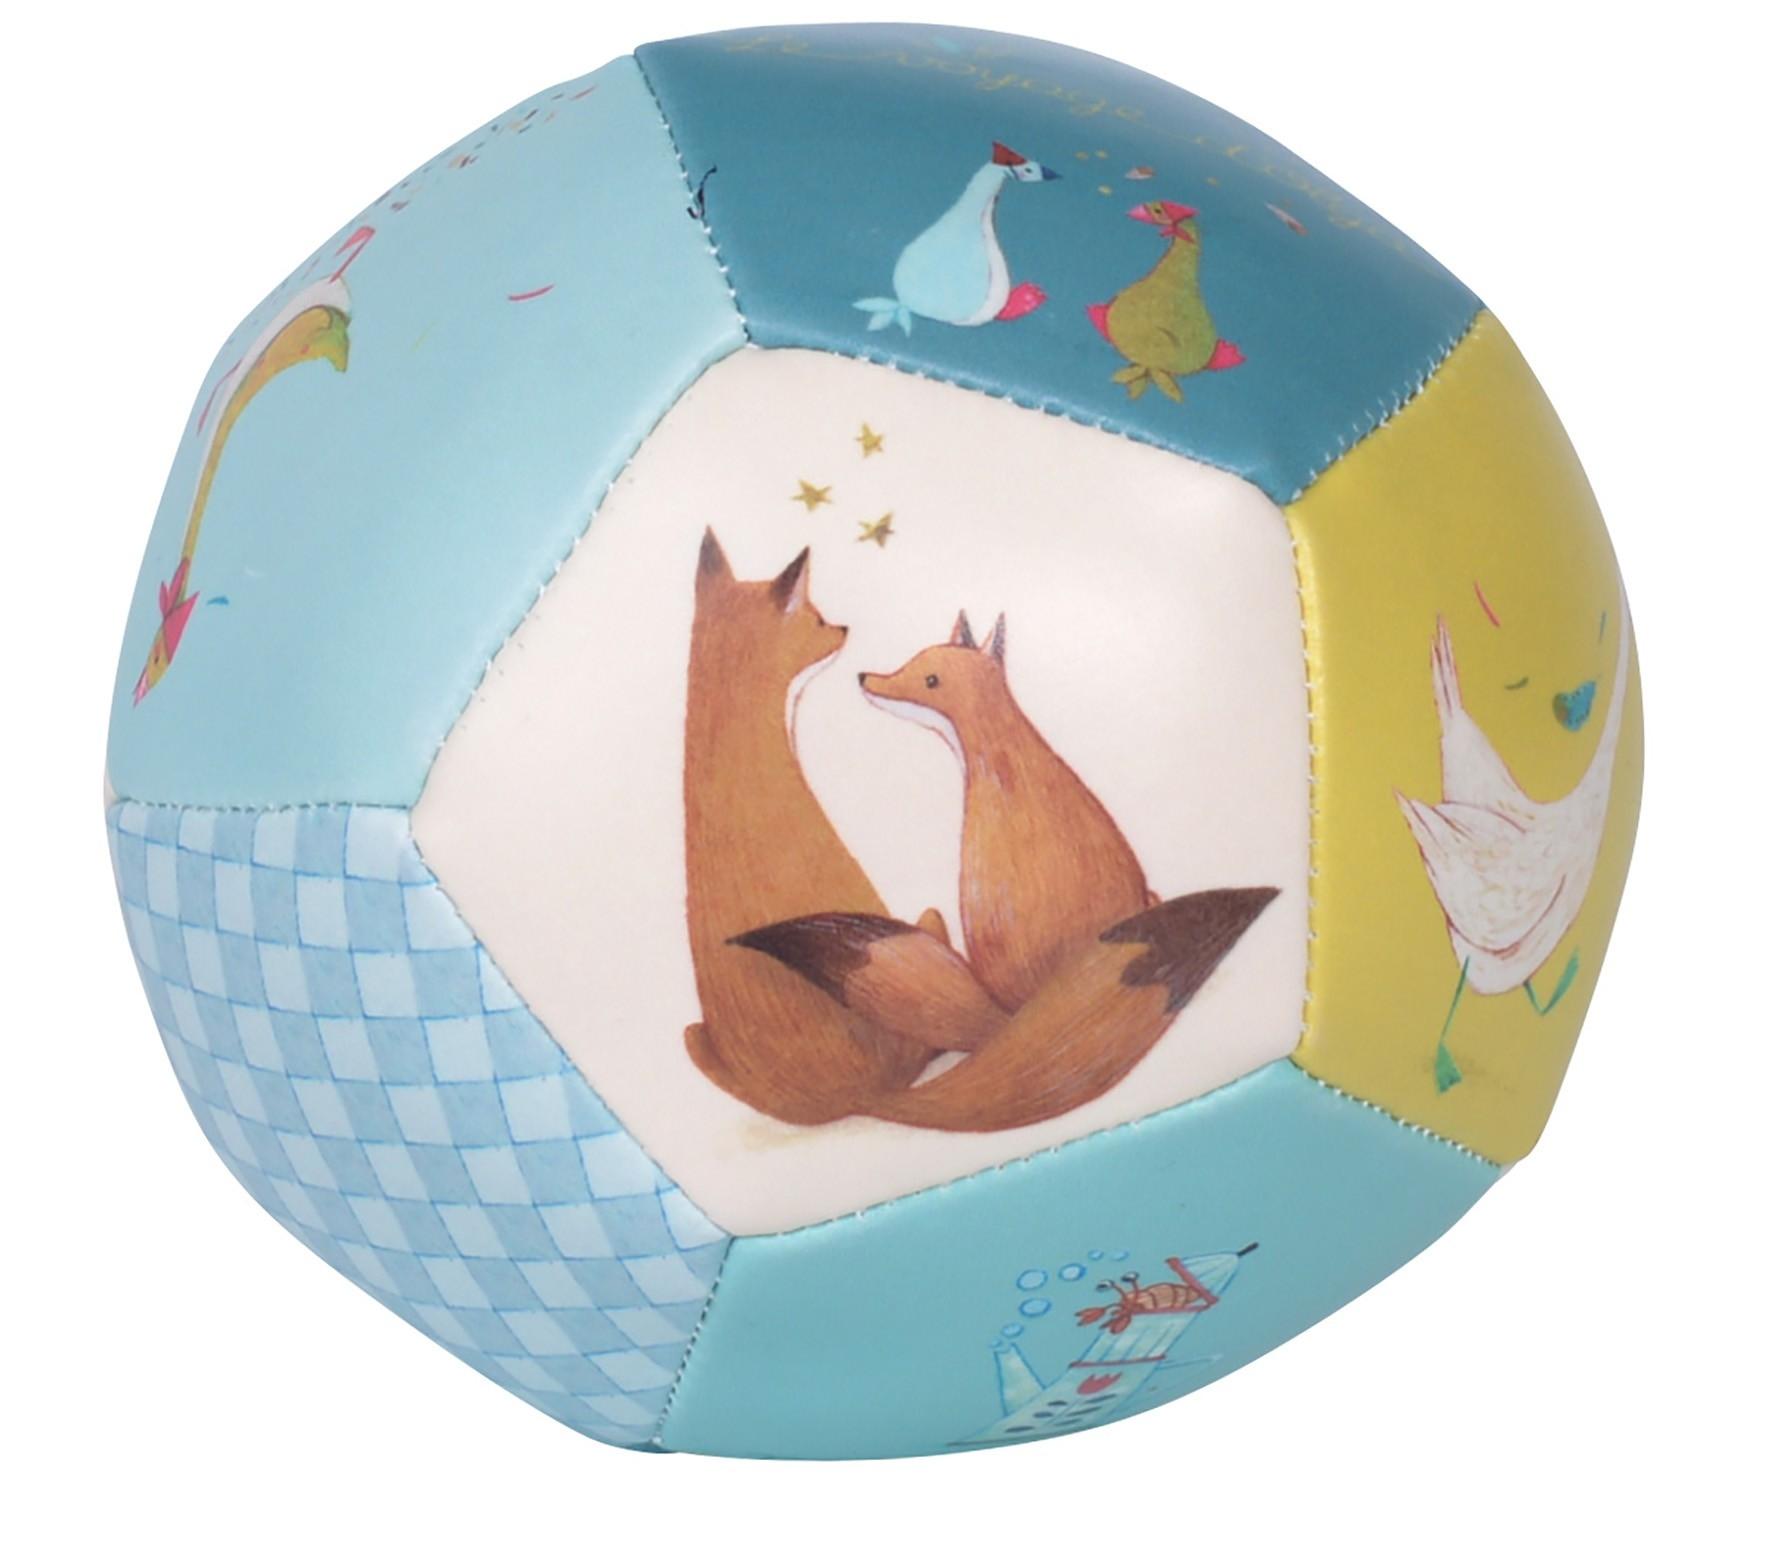 Ballon_souple_10cm_Le_Voyage_dOlga_Moulin_Roty_1